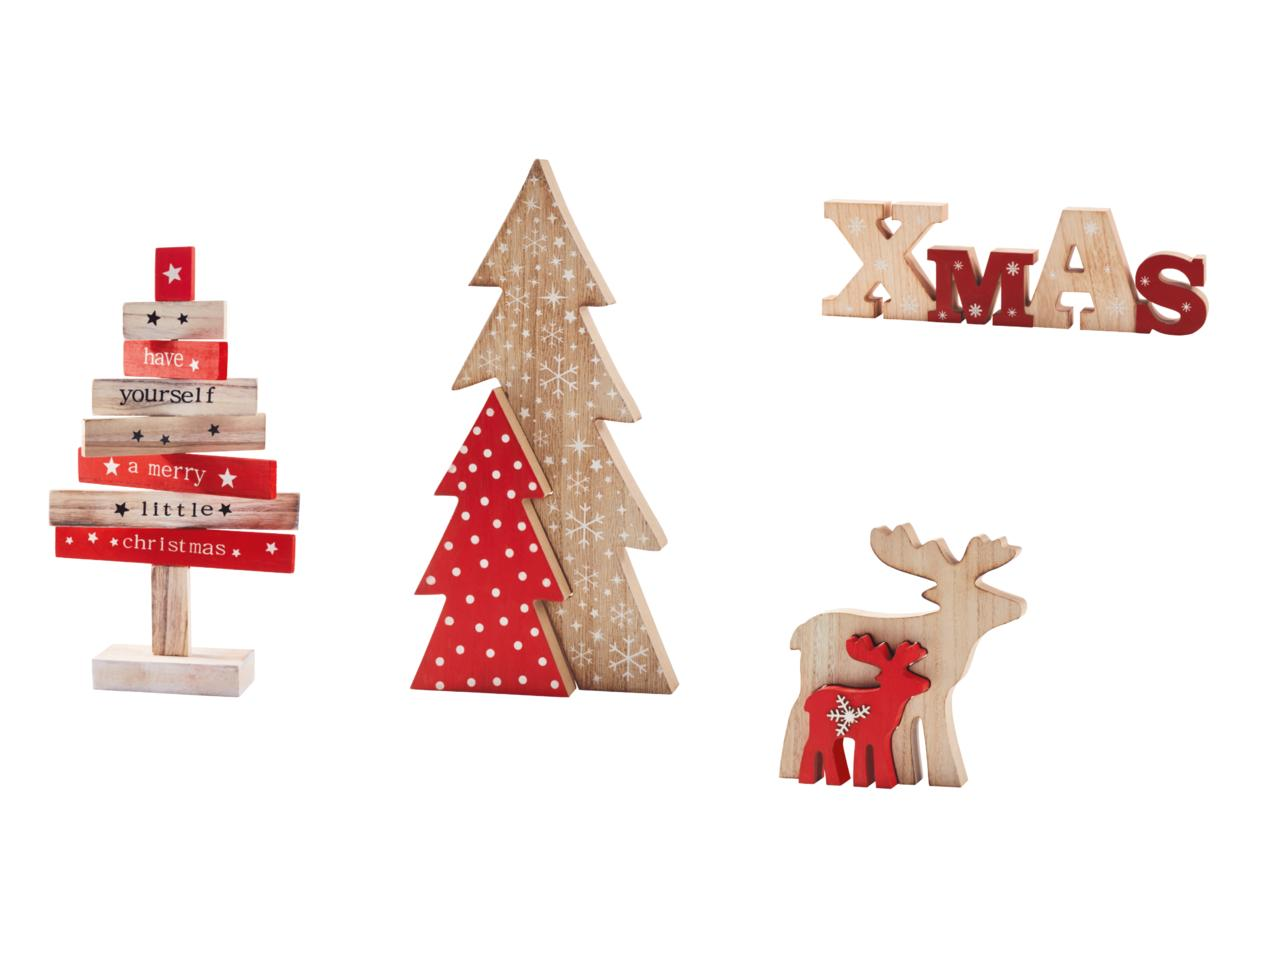 MELINERA Wooden Christmas Decorations - Lidl — Ireland - Specials ...